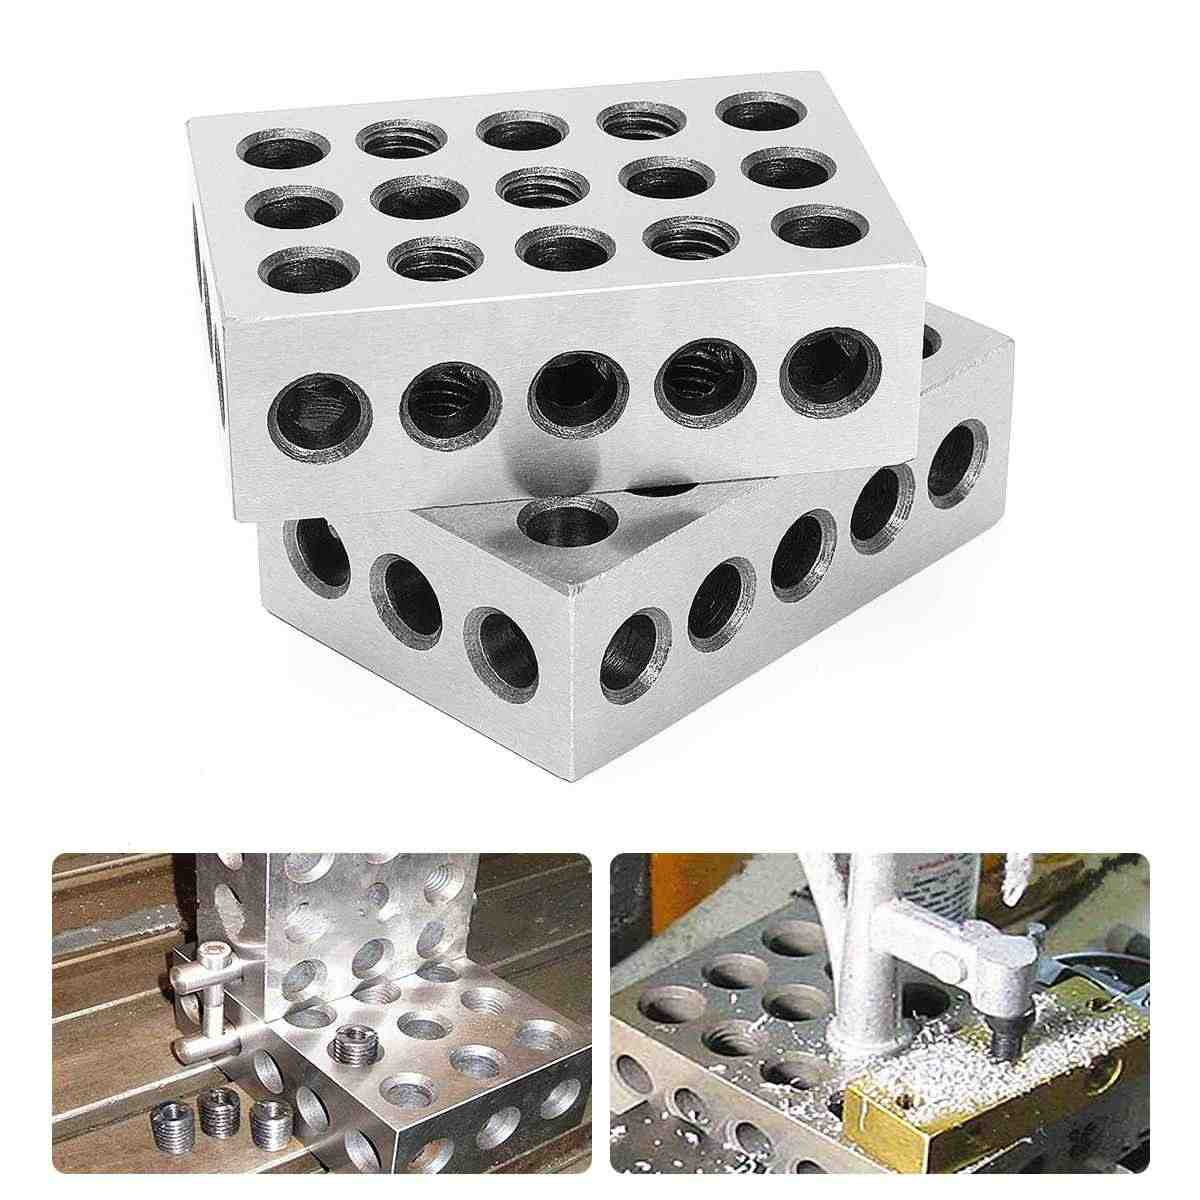 "2Pcs Precision Blocks Hardened Steel 1-2-3 Blocks 0.0001"" Precision Matched Machinist 123 Milling Tool 23 Holes"